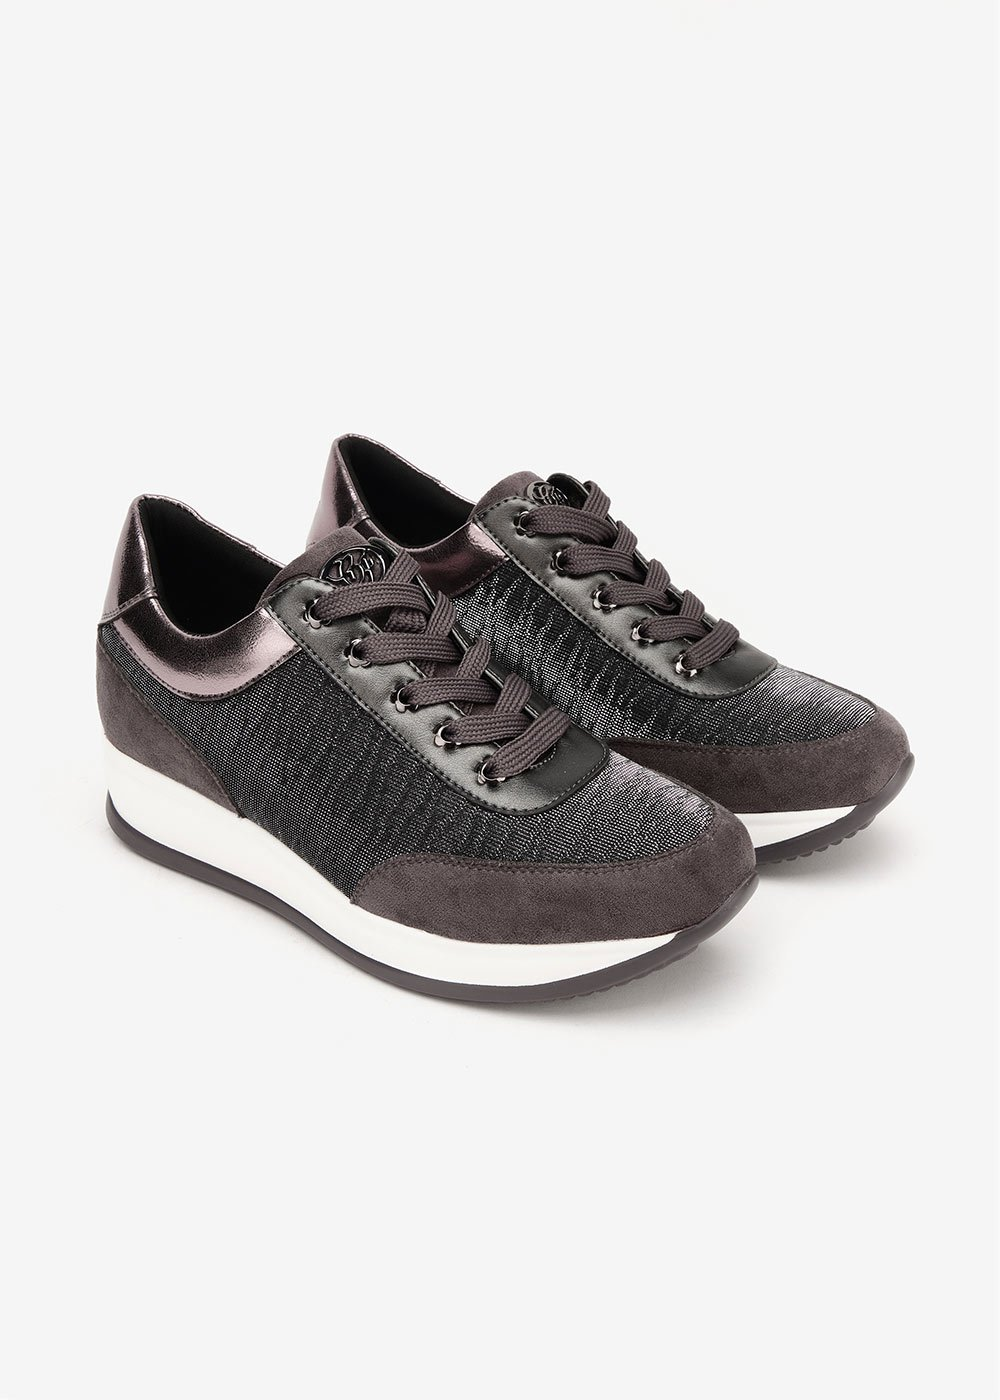 Shirl sneakers in mesh fabric - Brown - Woman